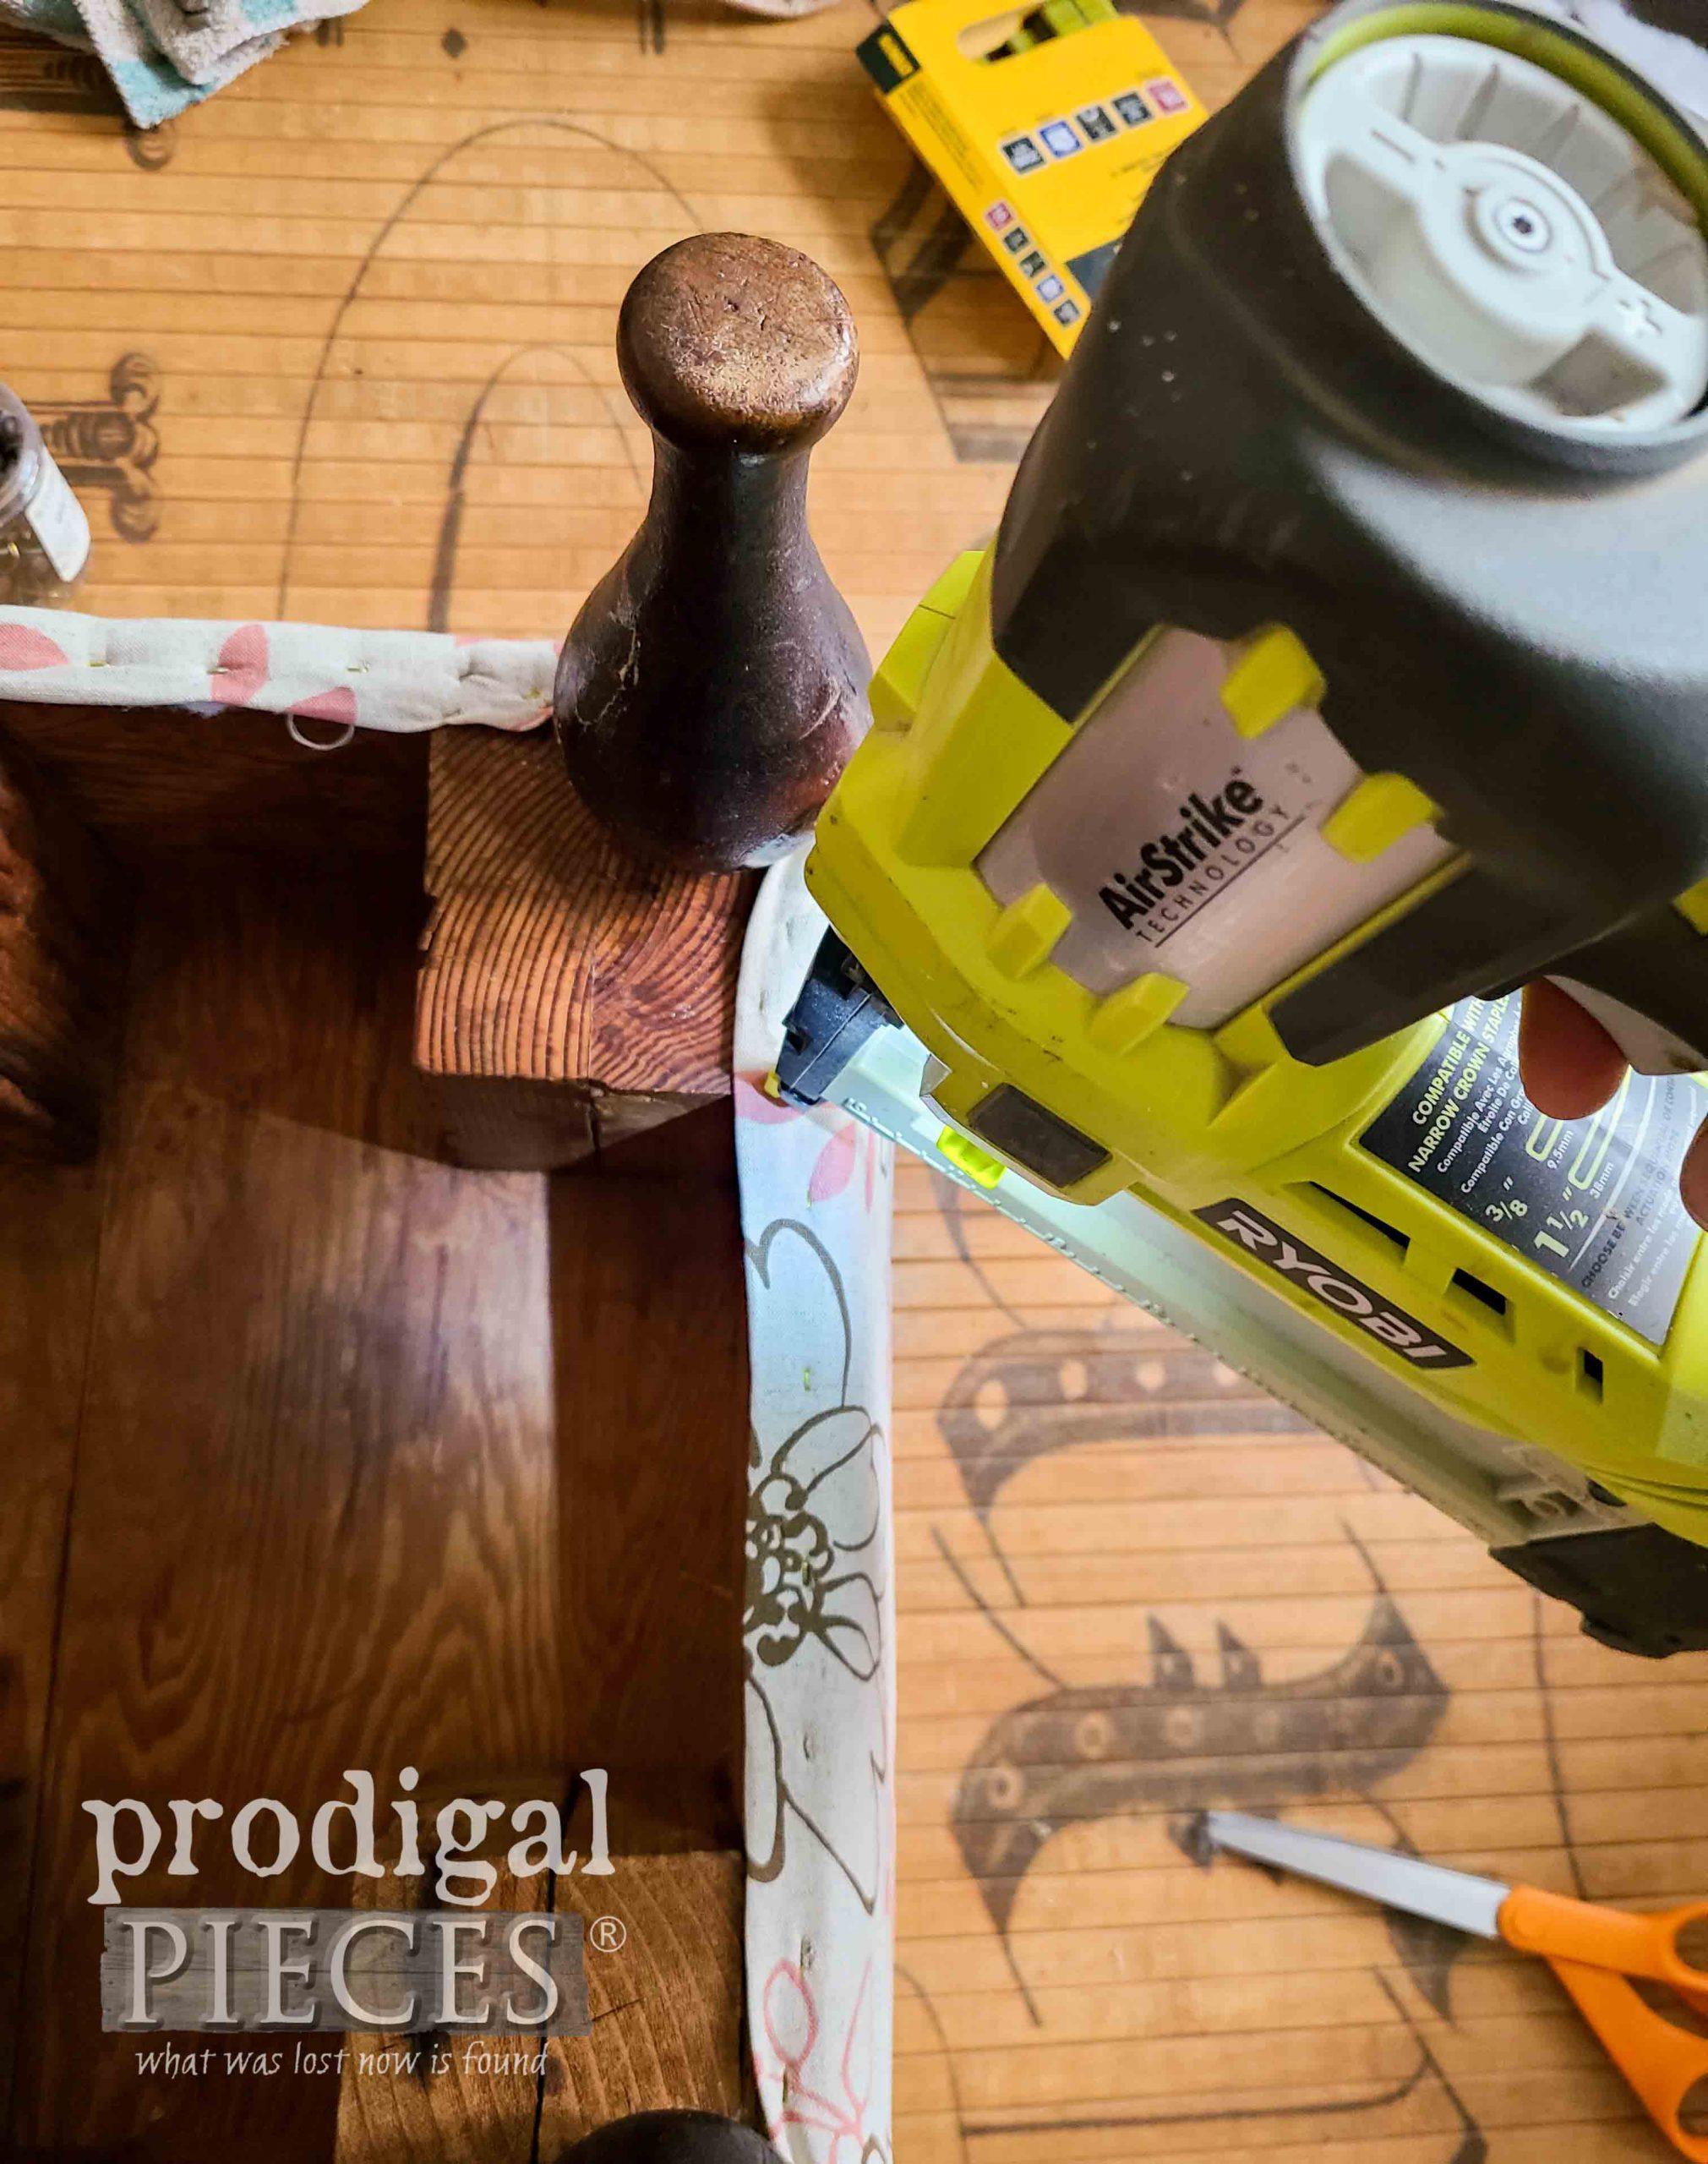 Stapling New Upholstery on Vintage Vinyl Footstool | prodigalpieces.com